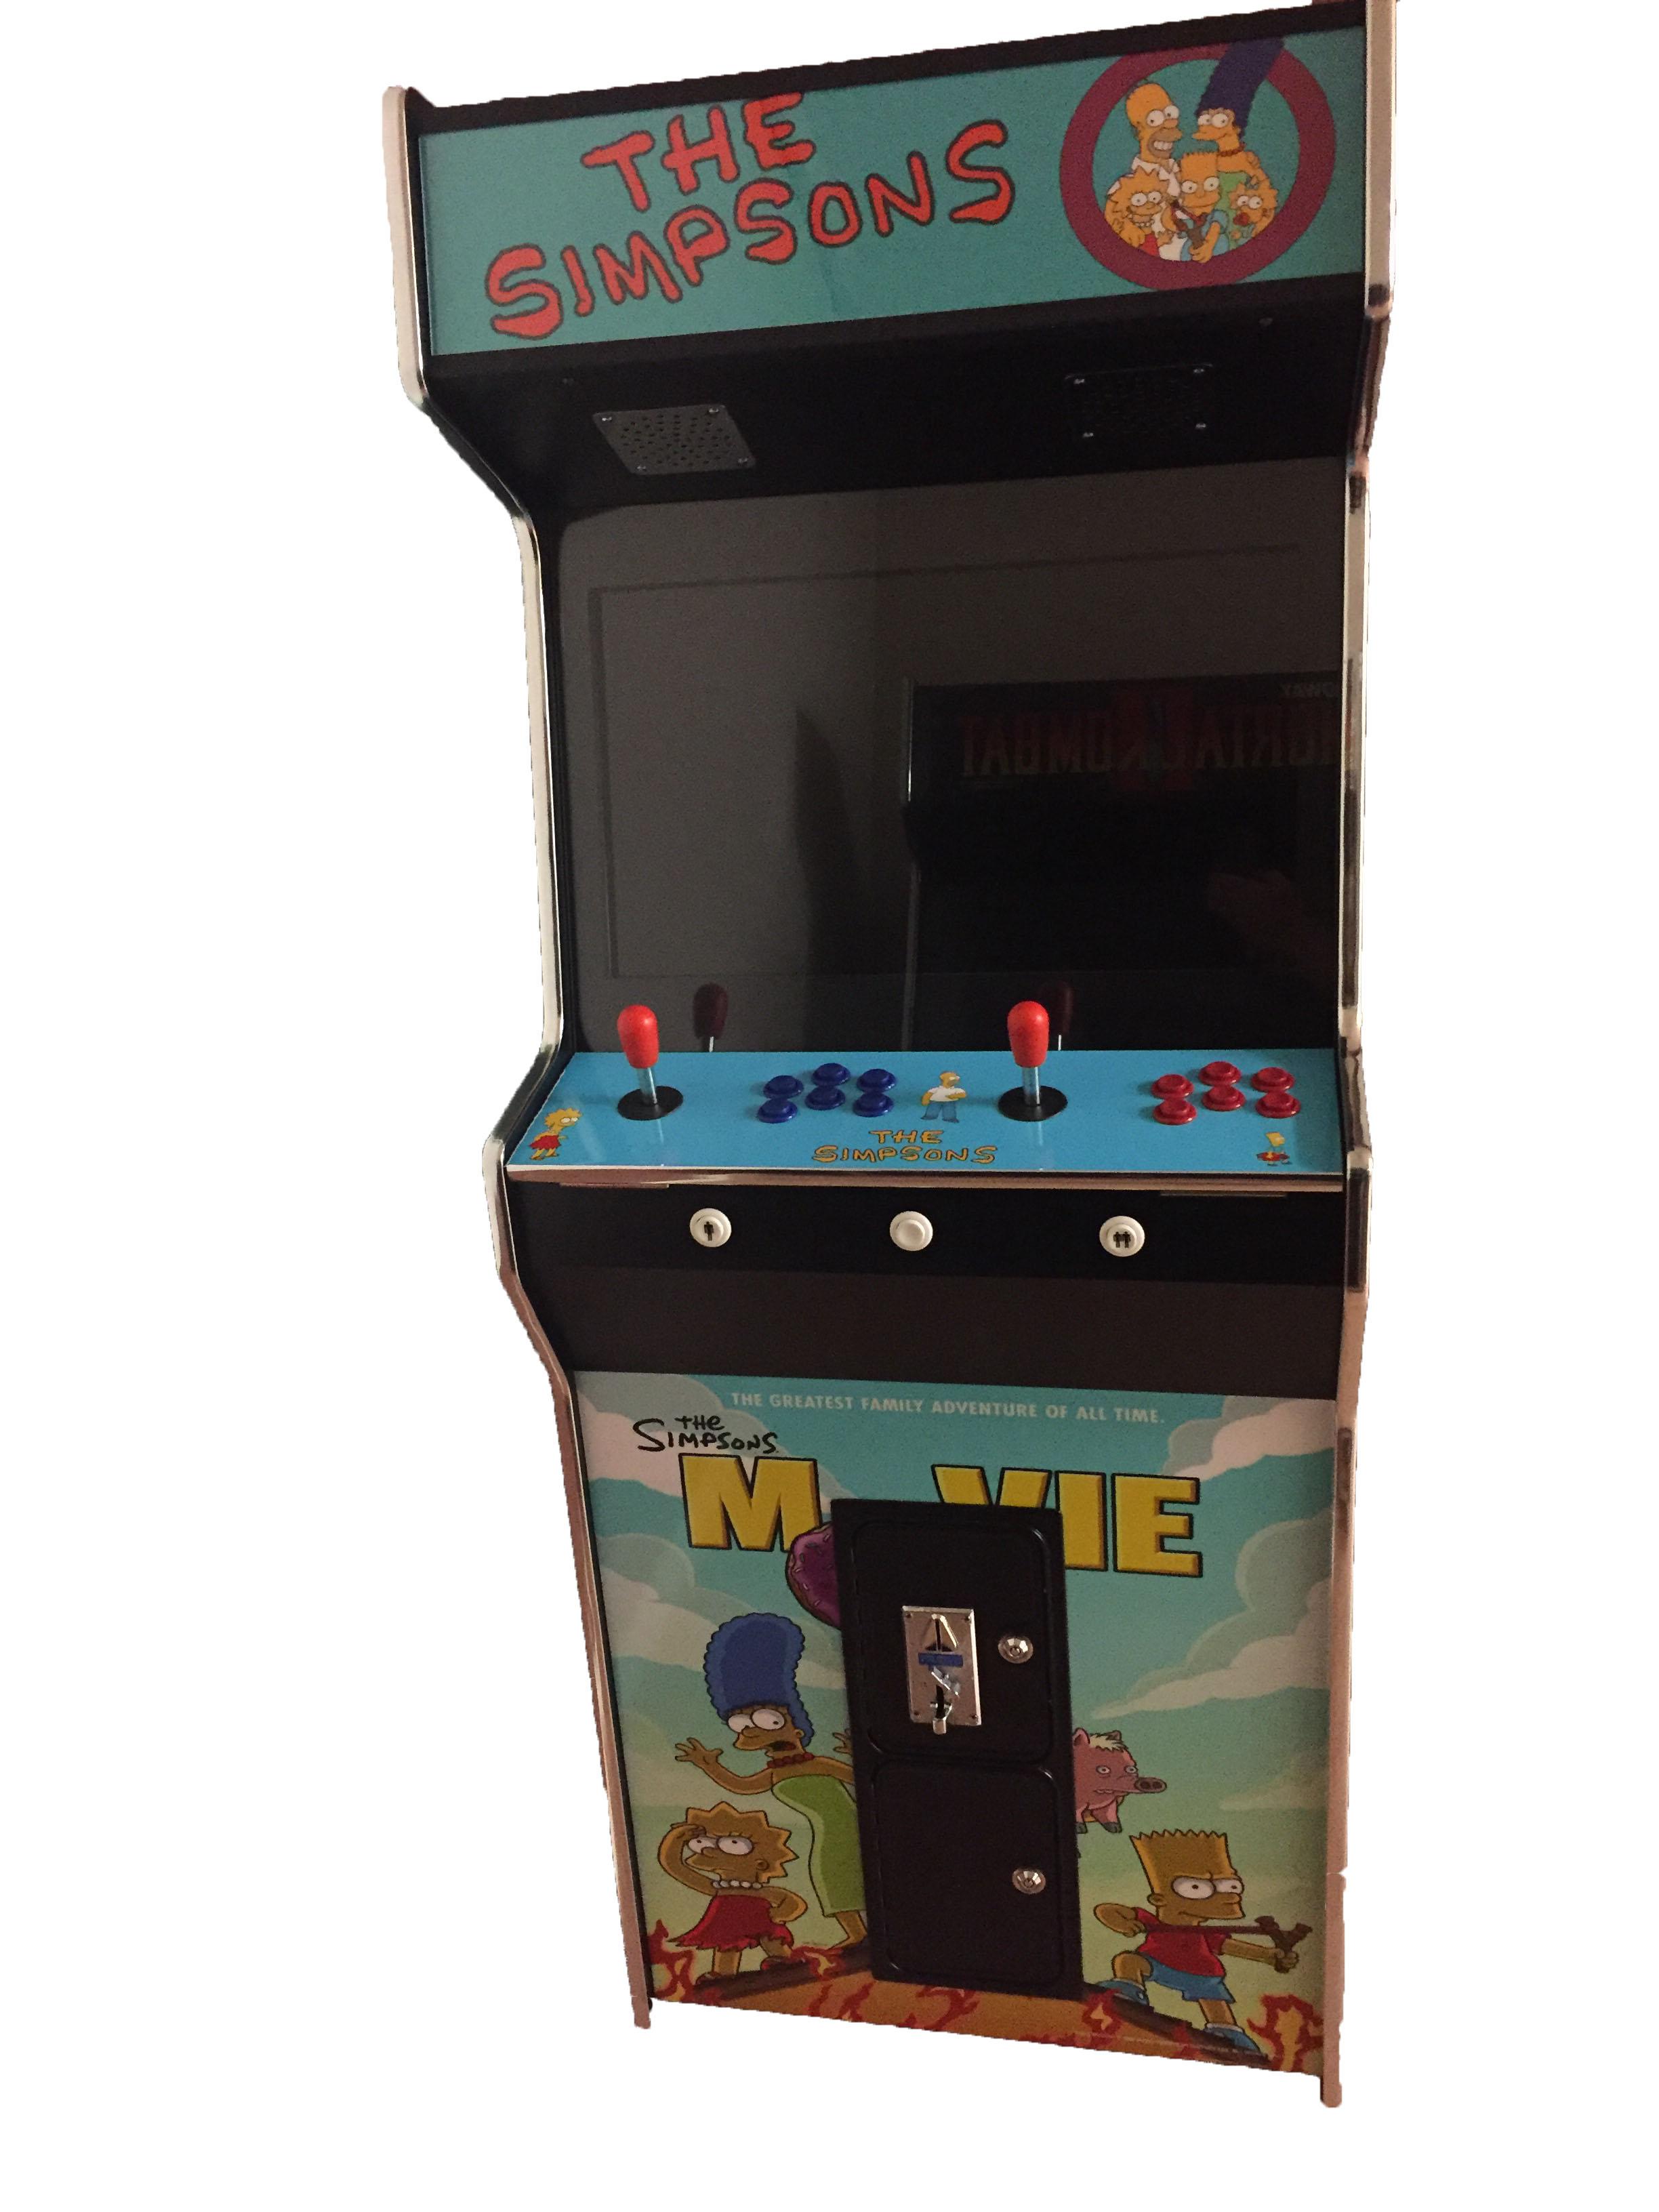 Arcade Rewind 3500 Game Upright Arcade Machine Simpsons